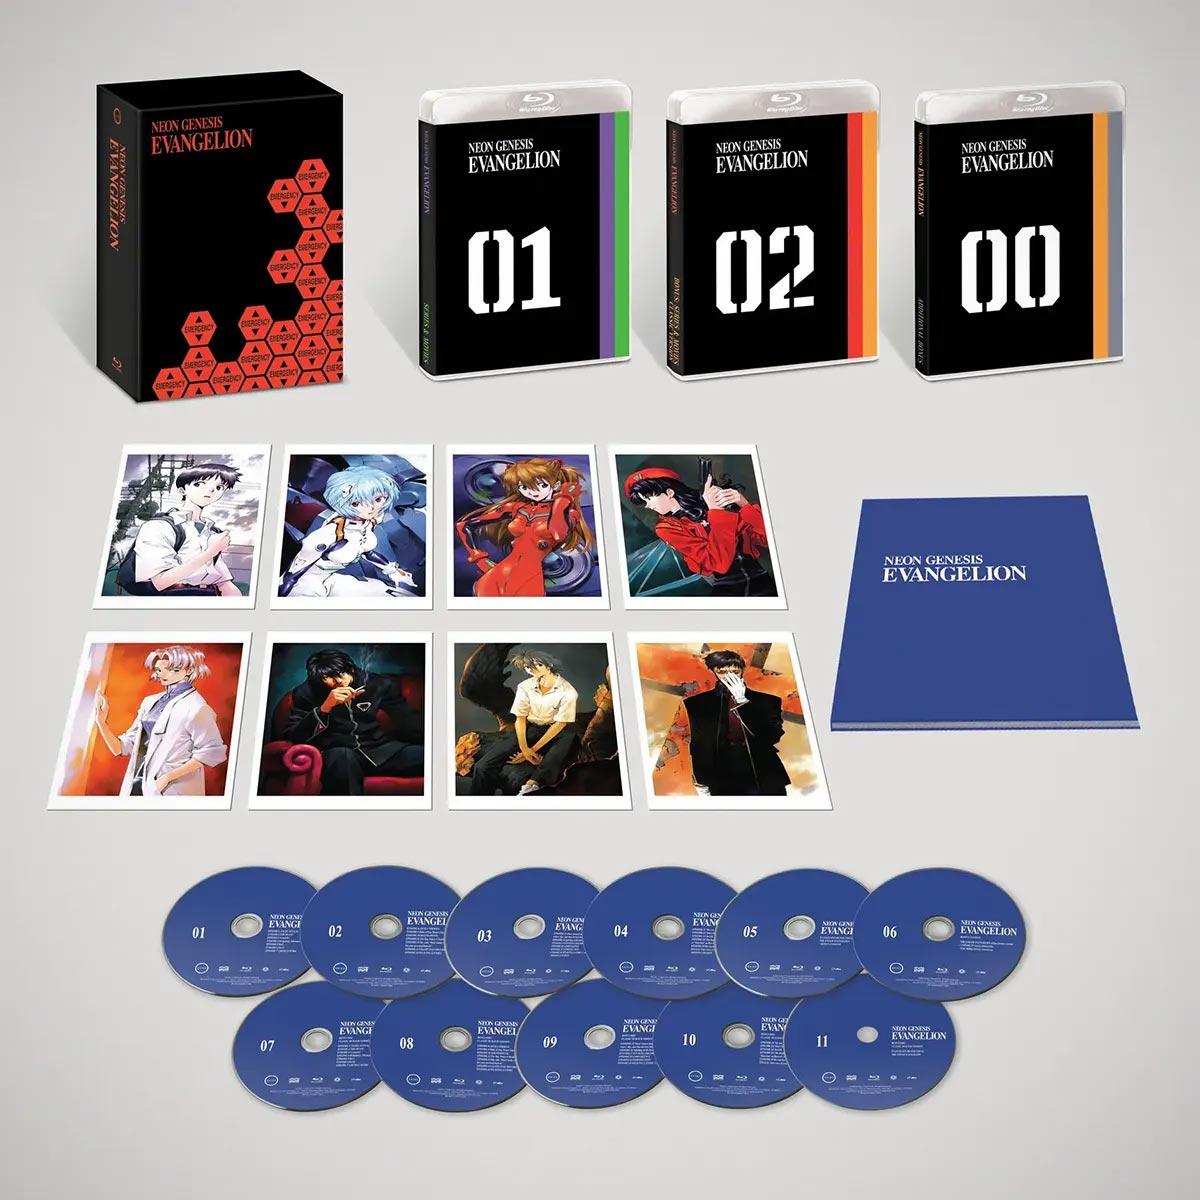 Neon Genesis Evangelion Collectors Edition